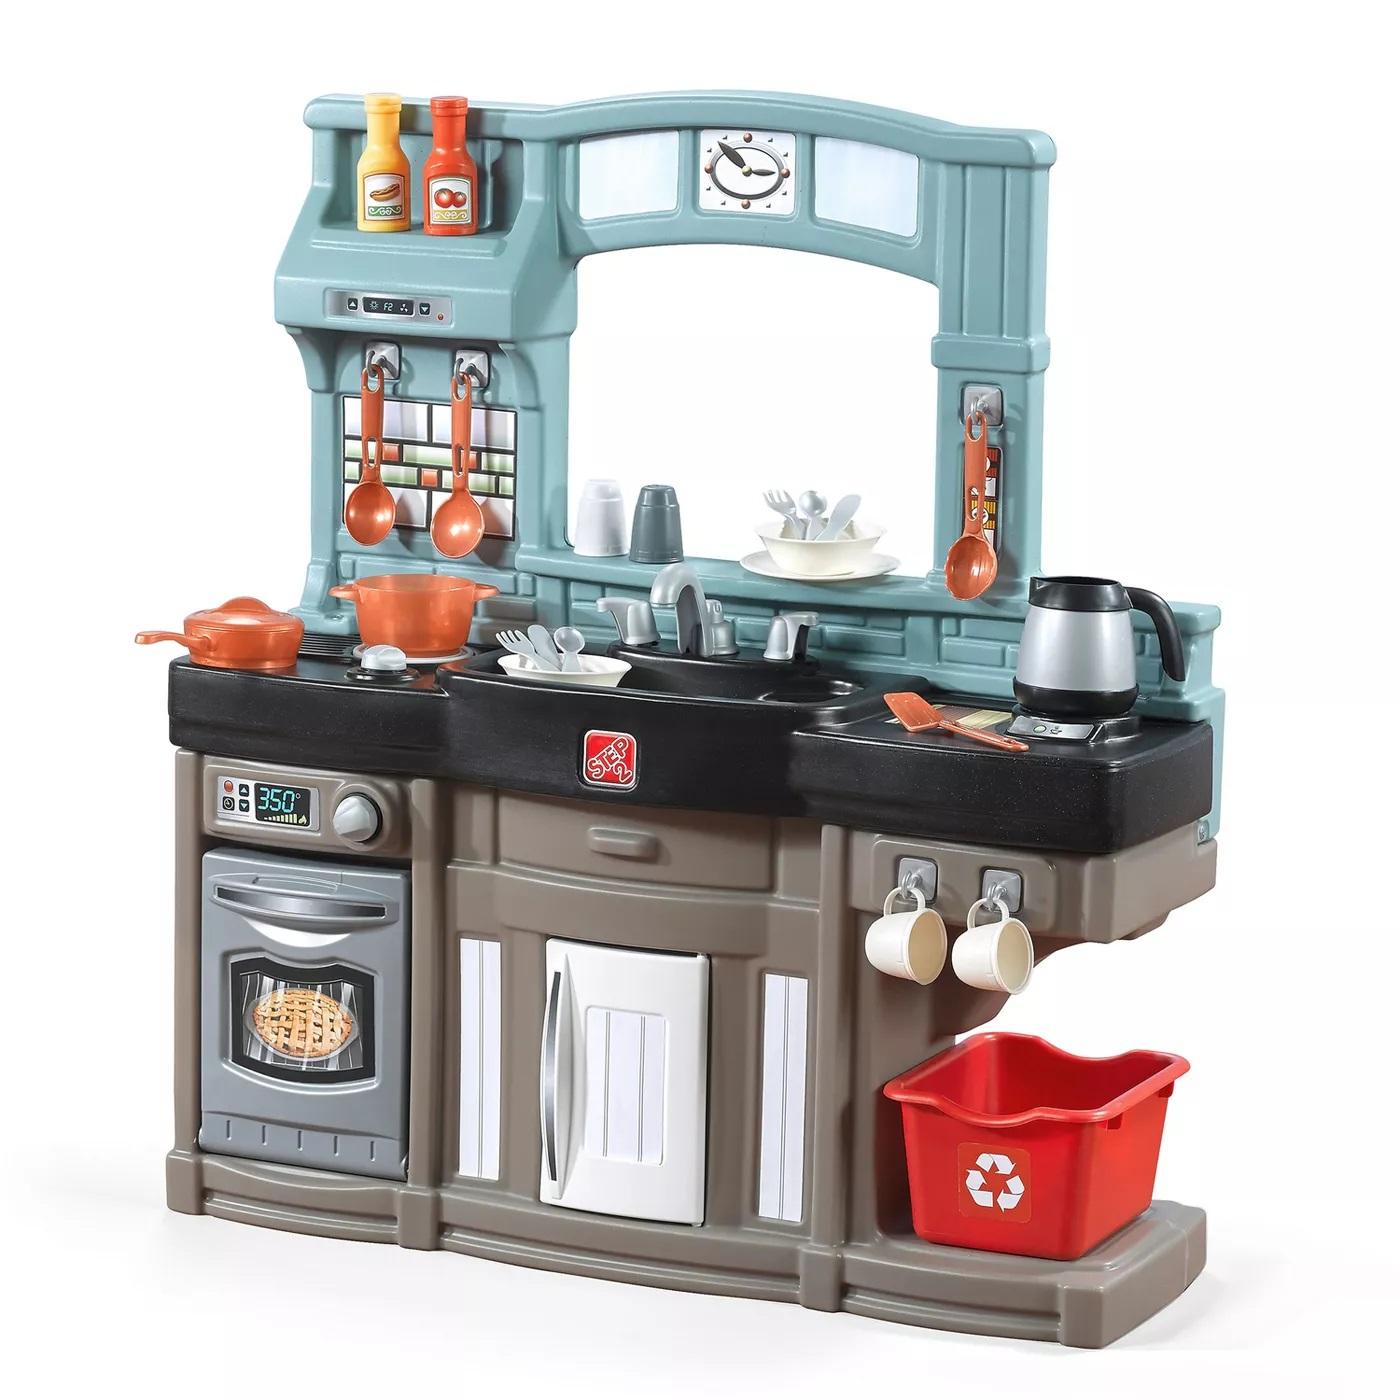 kitchens, play food & workshops image